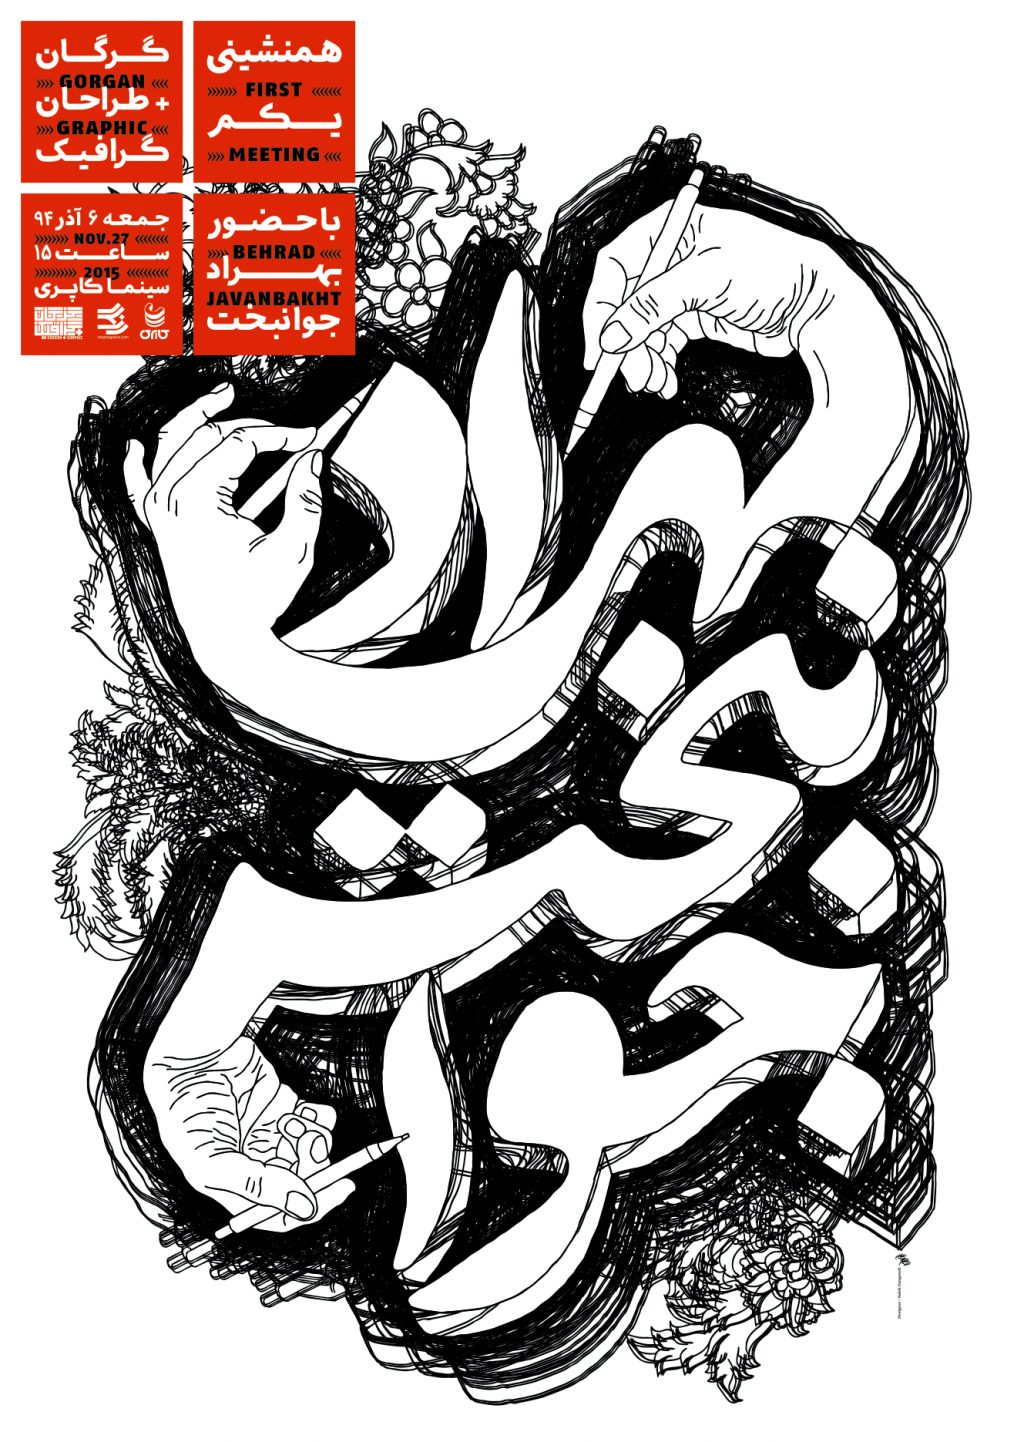 Gorgan Plus Graphic Designers First Meeting in Iran